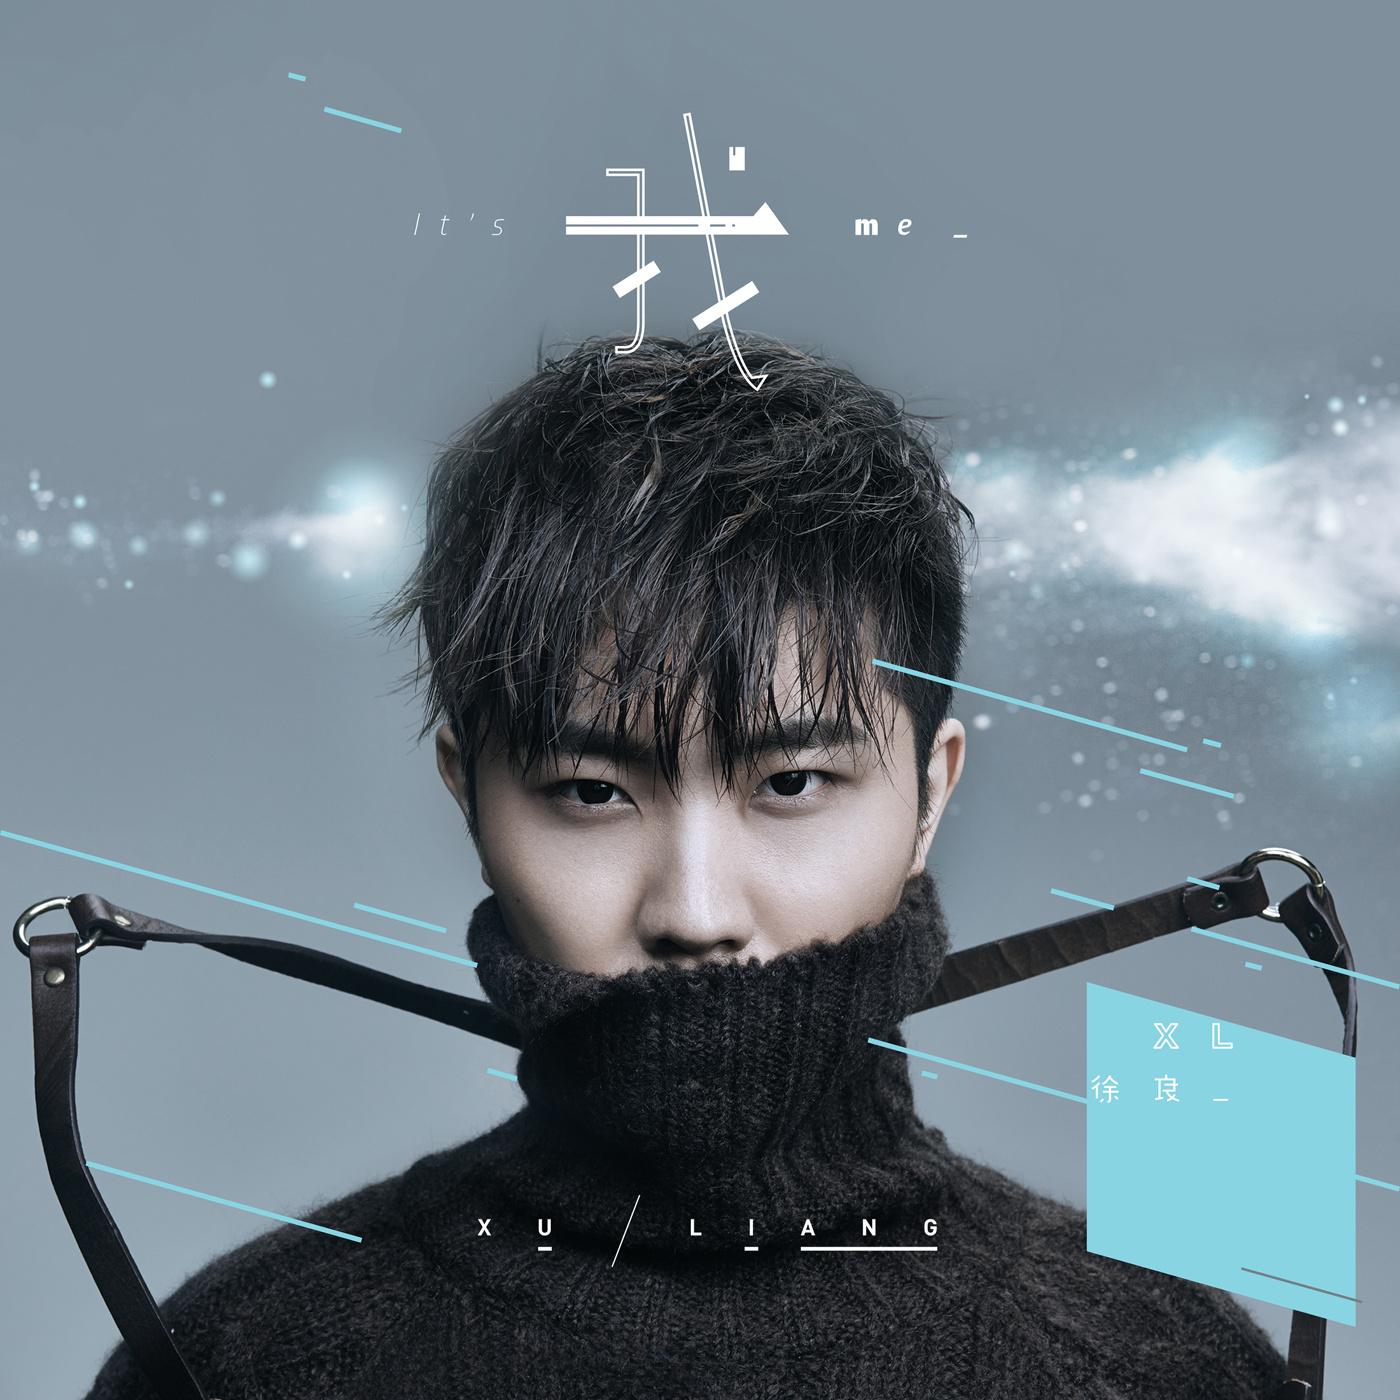 [Album] 我 It's me -  徐良 Xu Liang